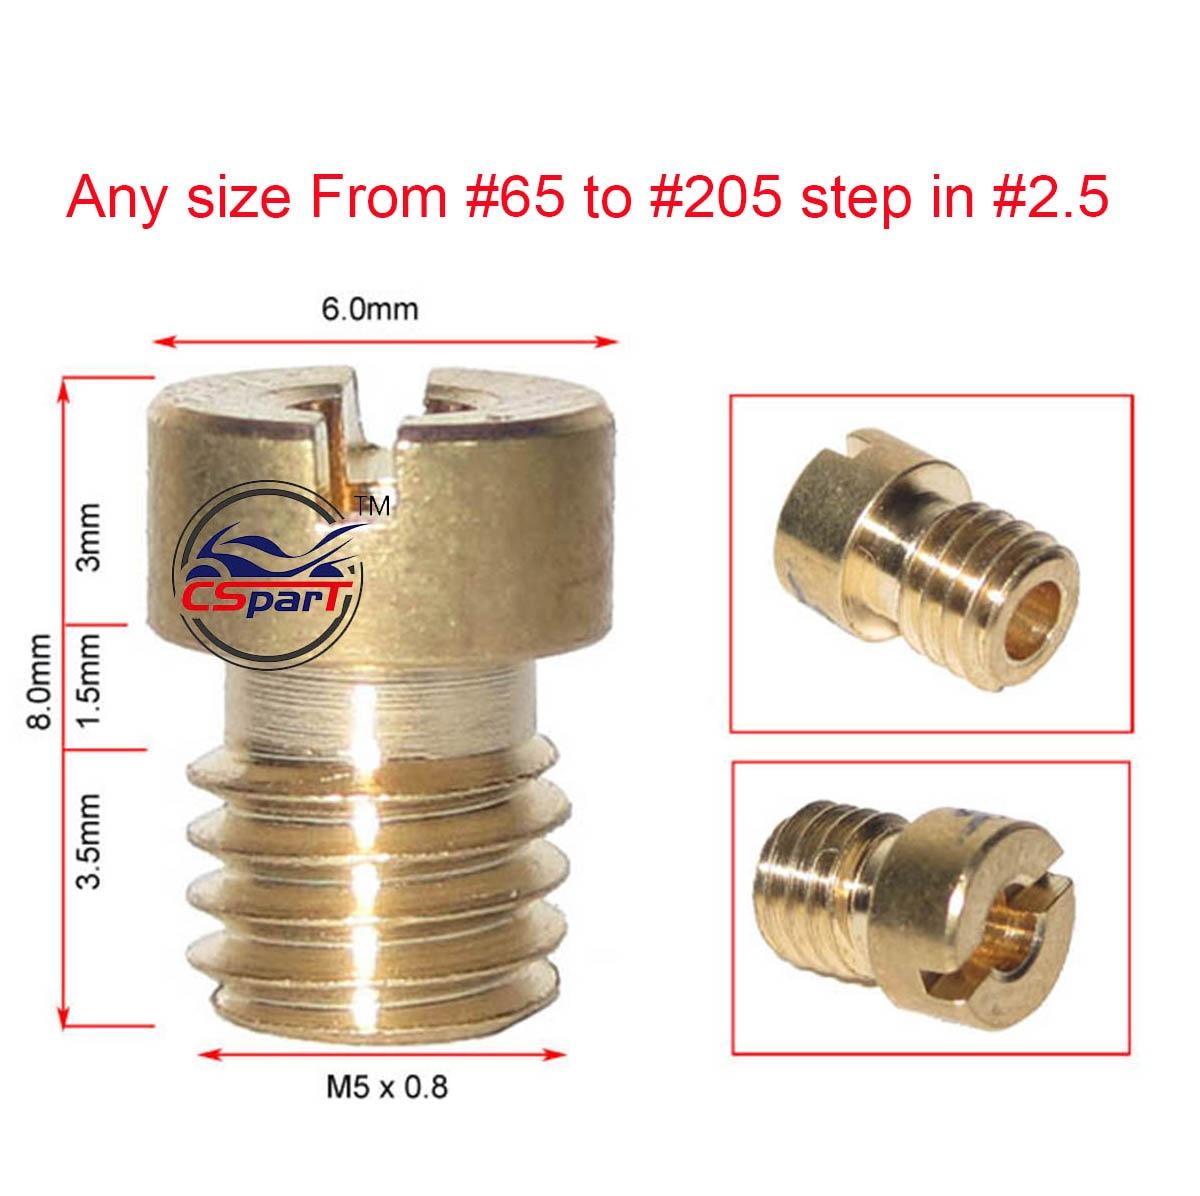 4 6 8 10 шт M5 круглая основная струя для Keihin CVK PE PZ PWK OKO KOSO карбюратор 65 до 205